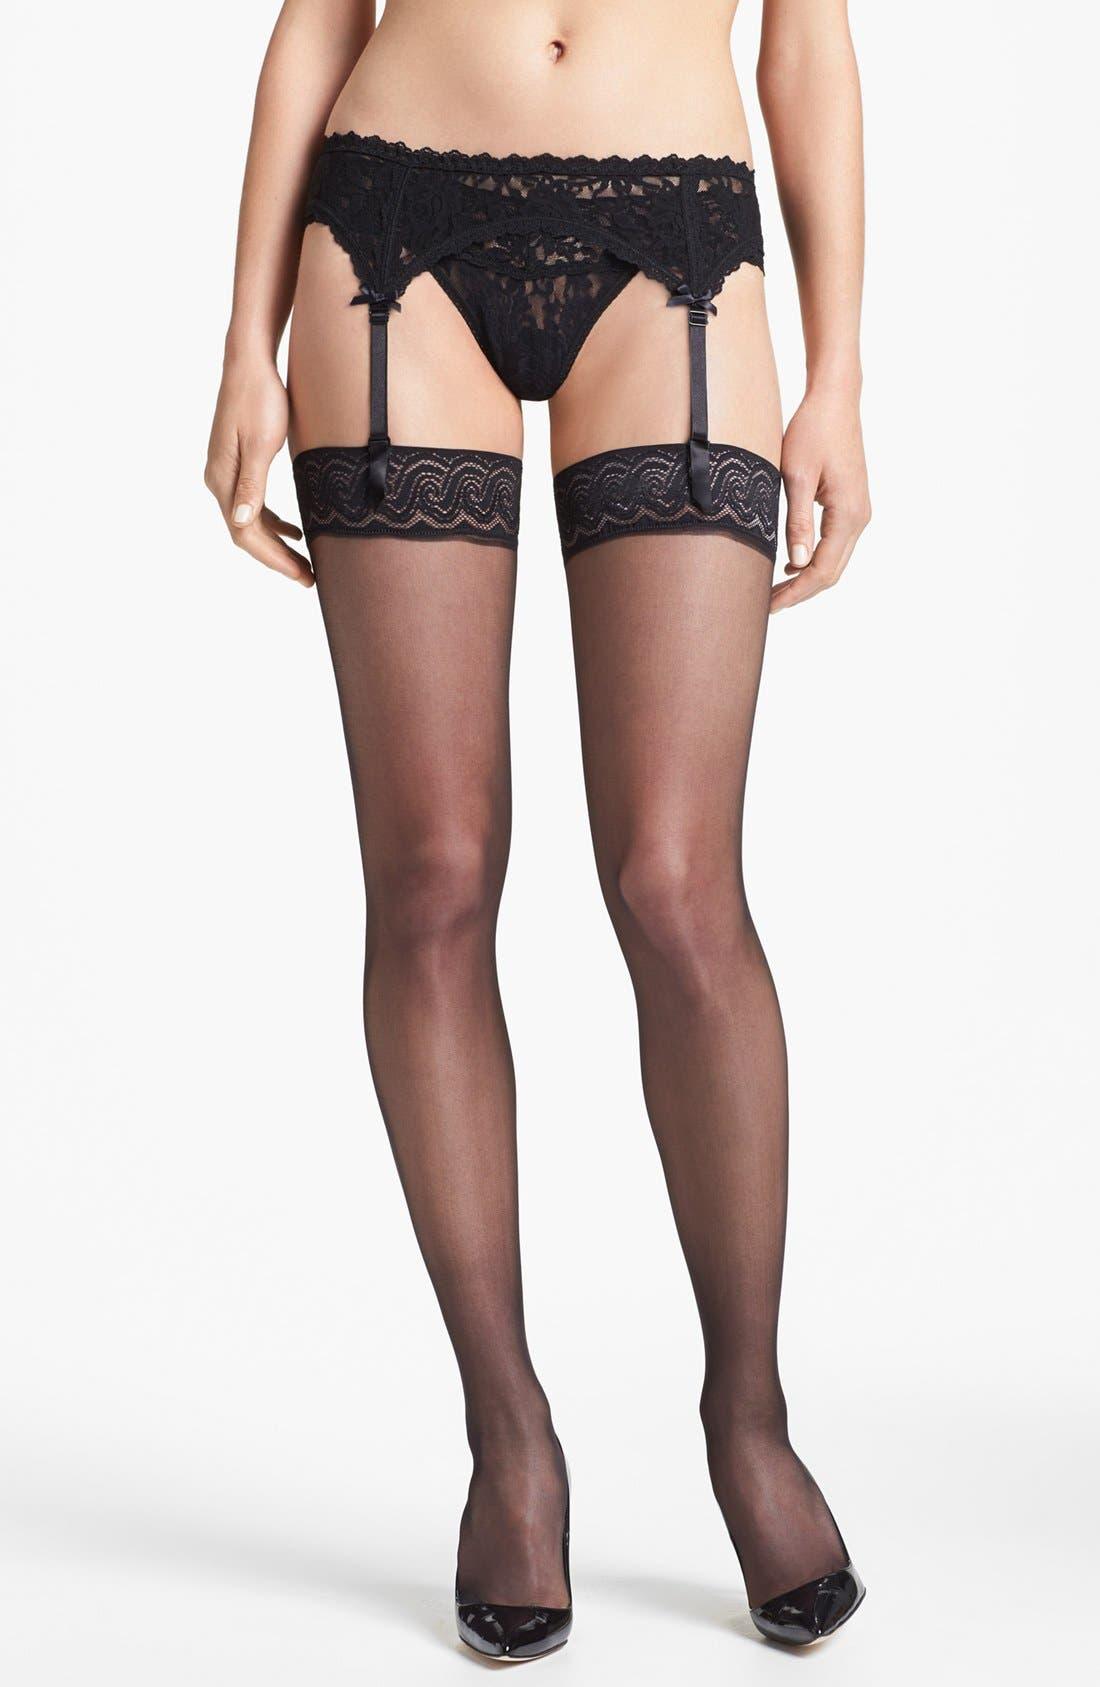 Alternate Image 1 Selected - Pretty Polly 10 Denier Gloss Thigh High Stockings